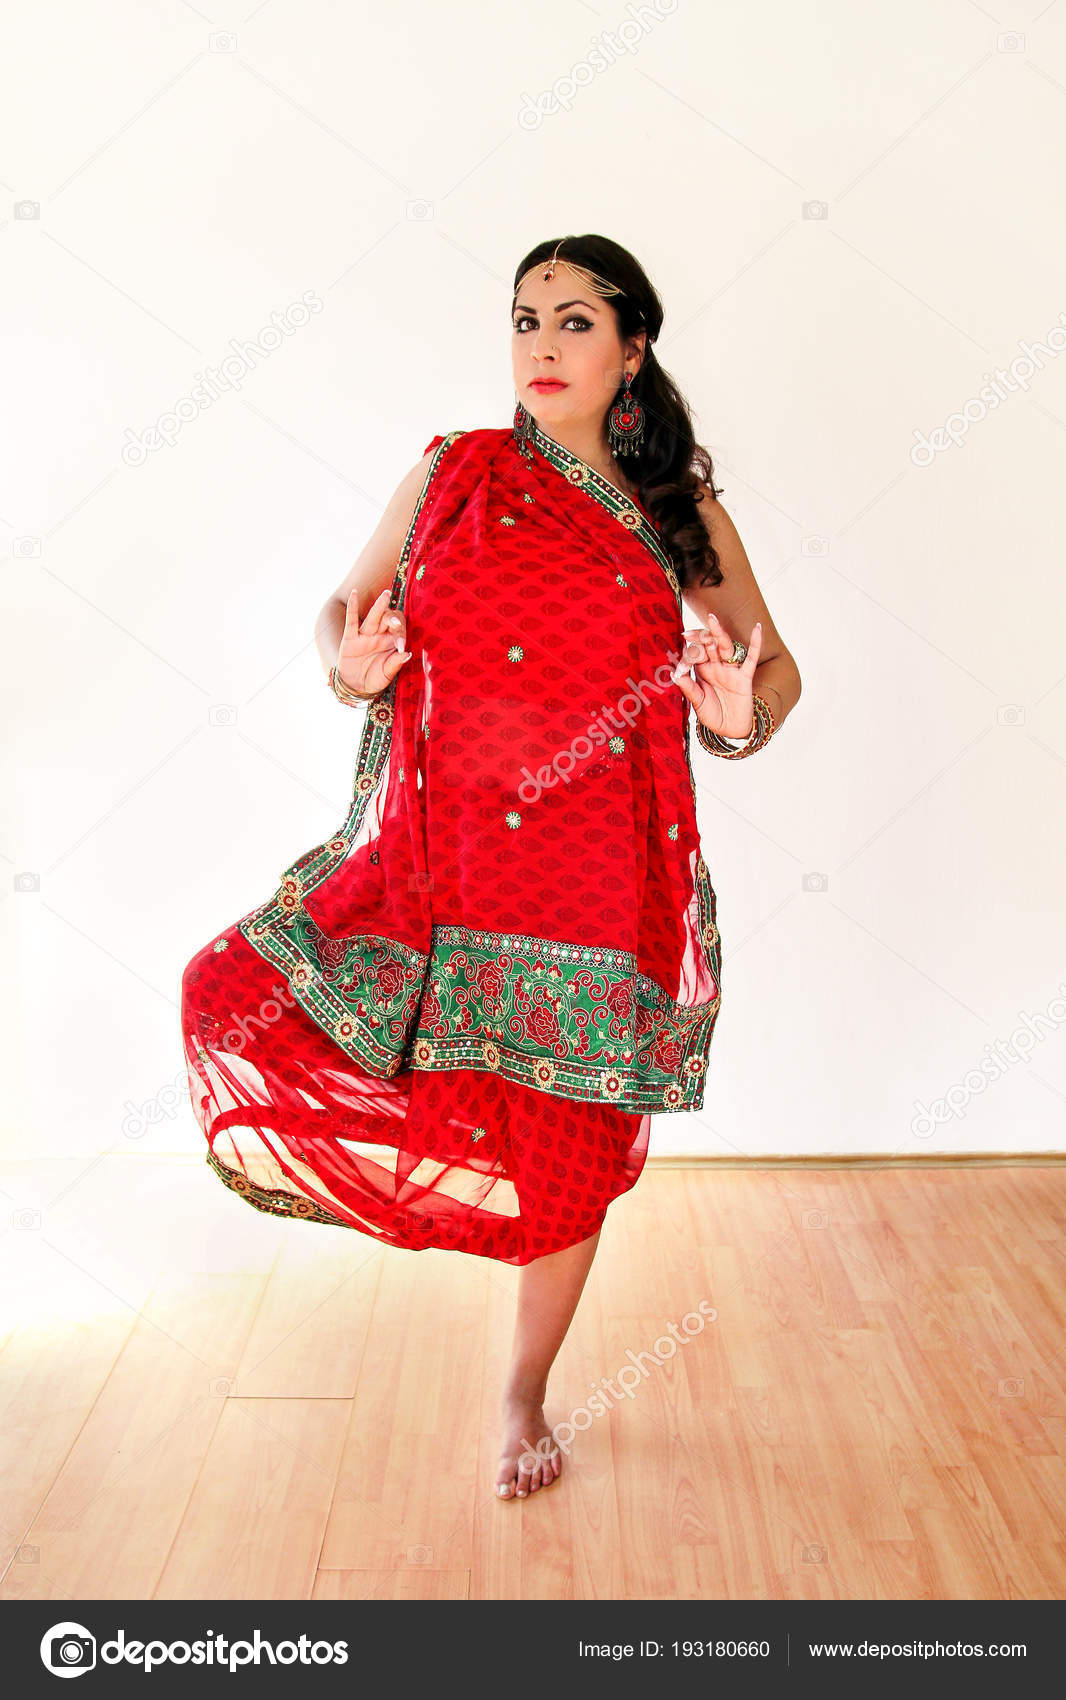 depositphotos 193180660-stock-photo-woman-dancing-indian-dance-in.jpg b62f67c9cc0